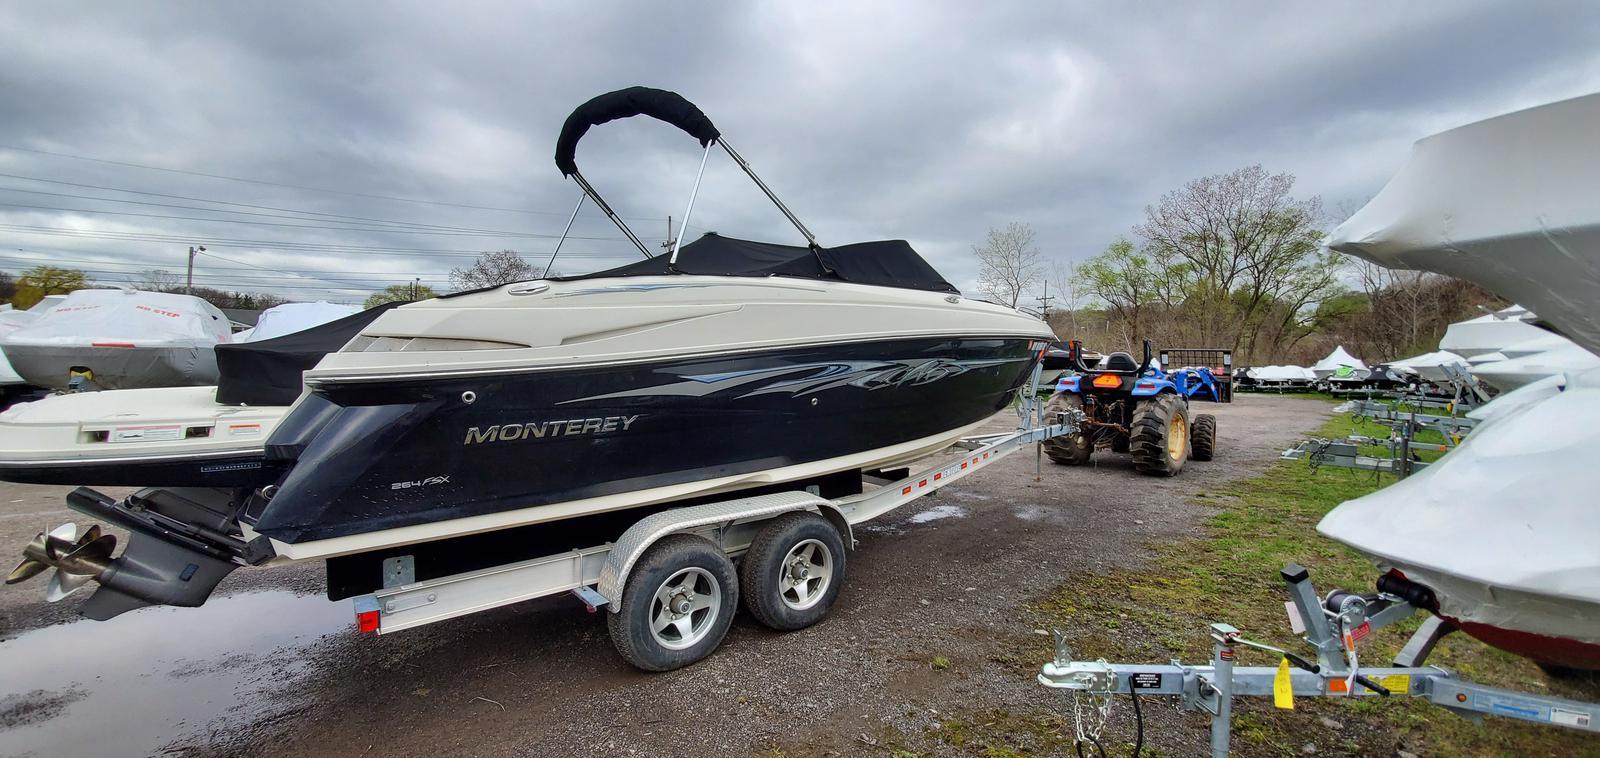 2012 Monterey Sport Boat 264FS/FSX for sale in Rochester, NY